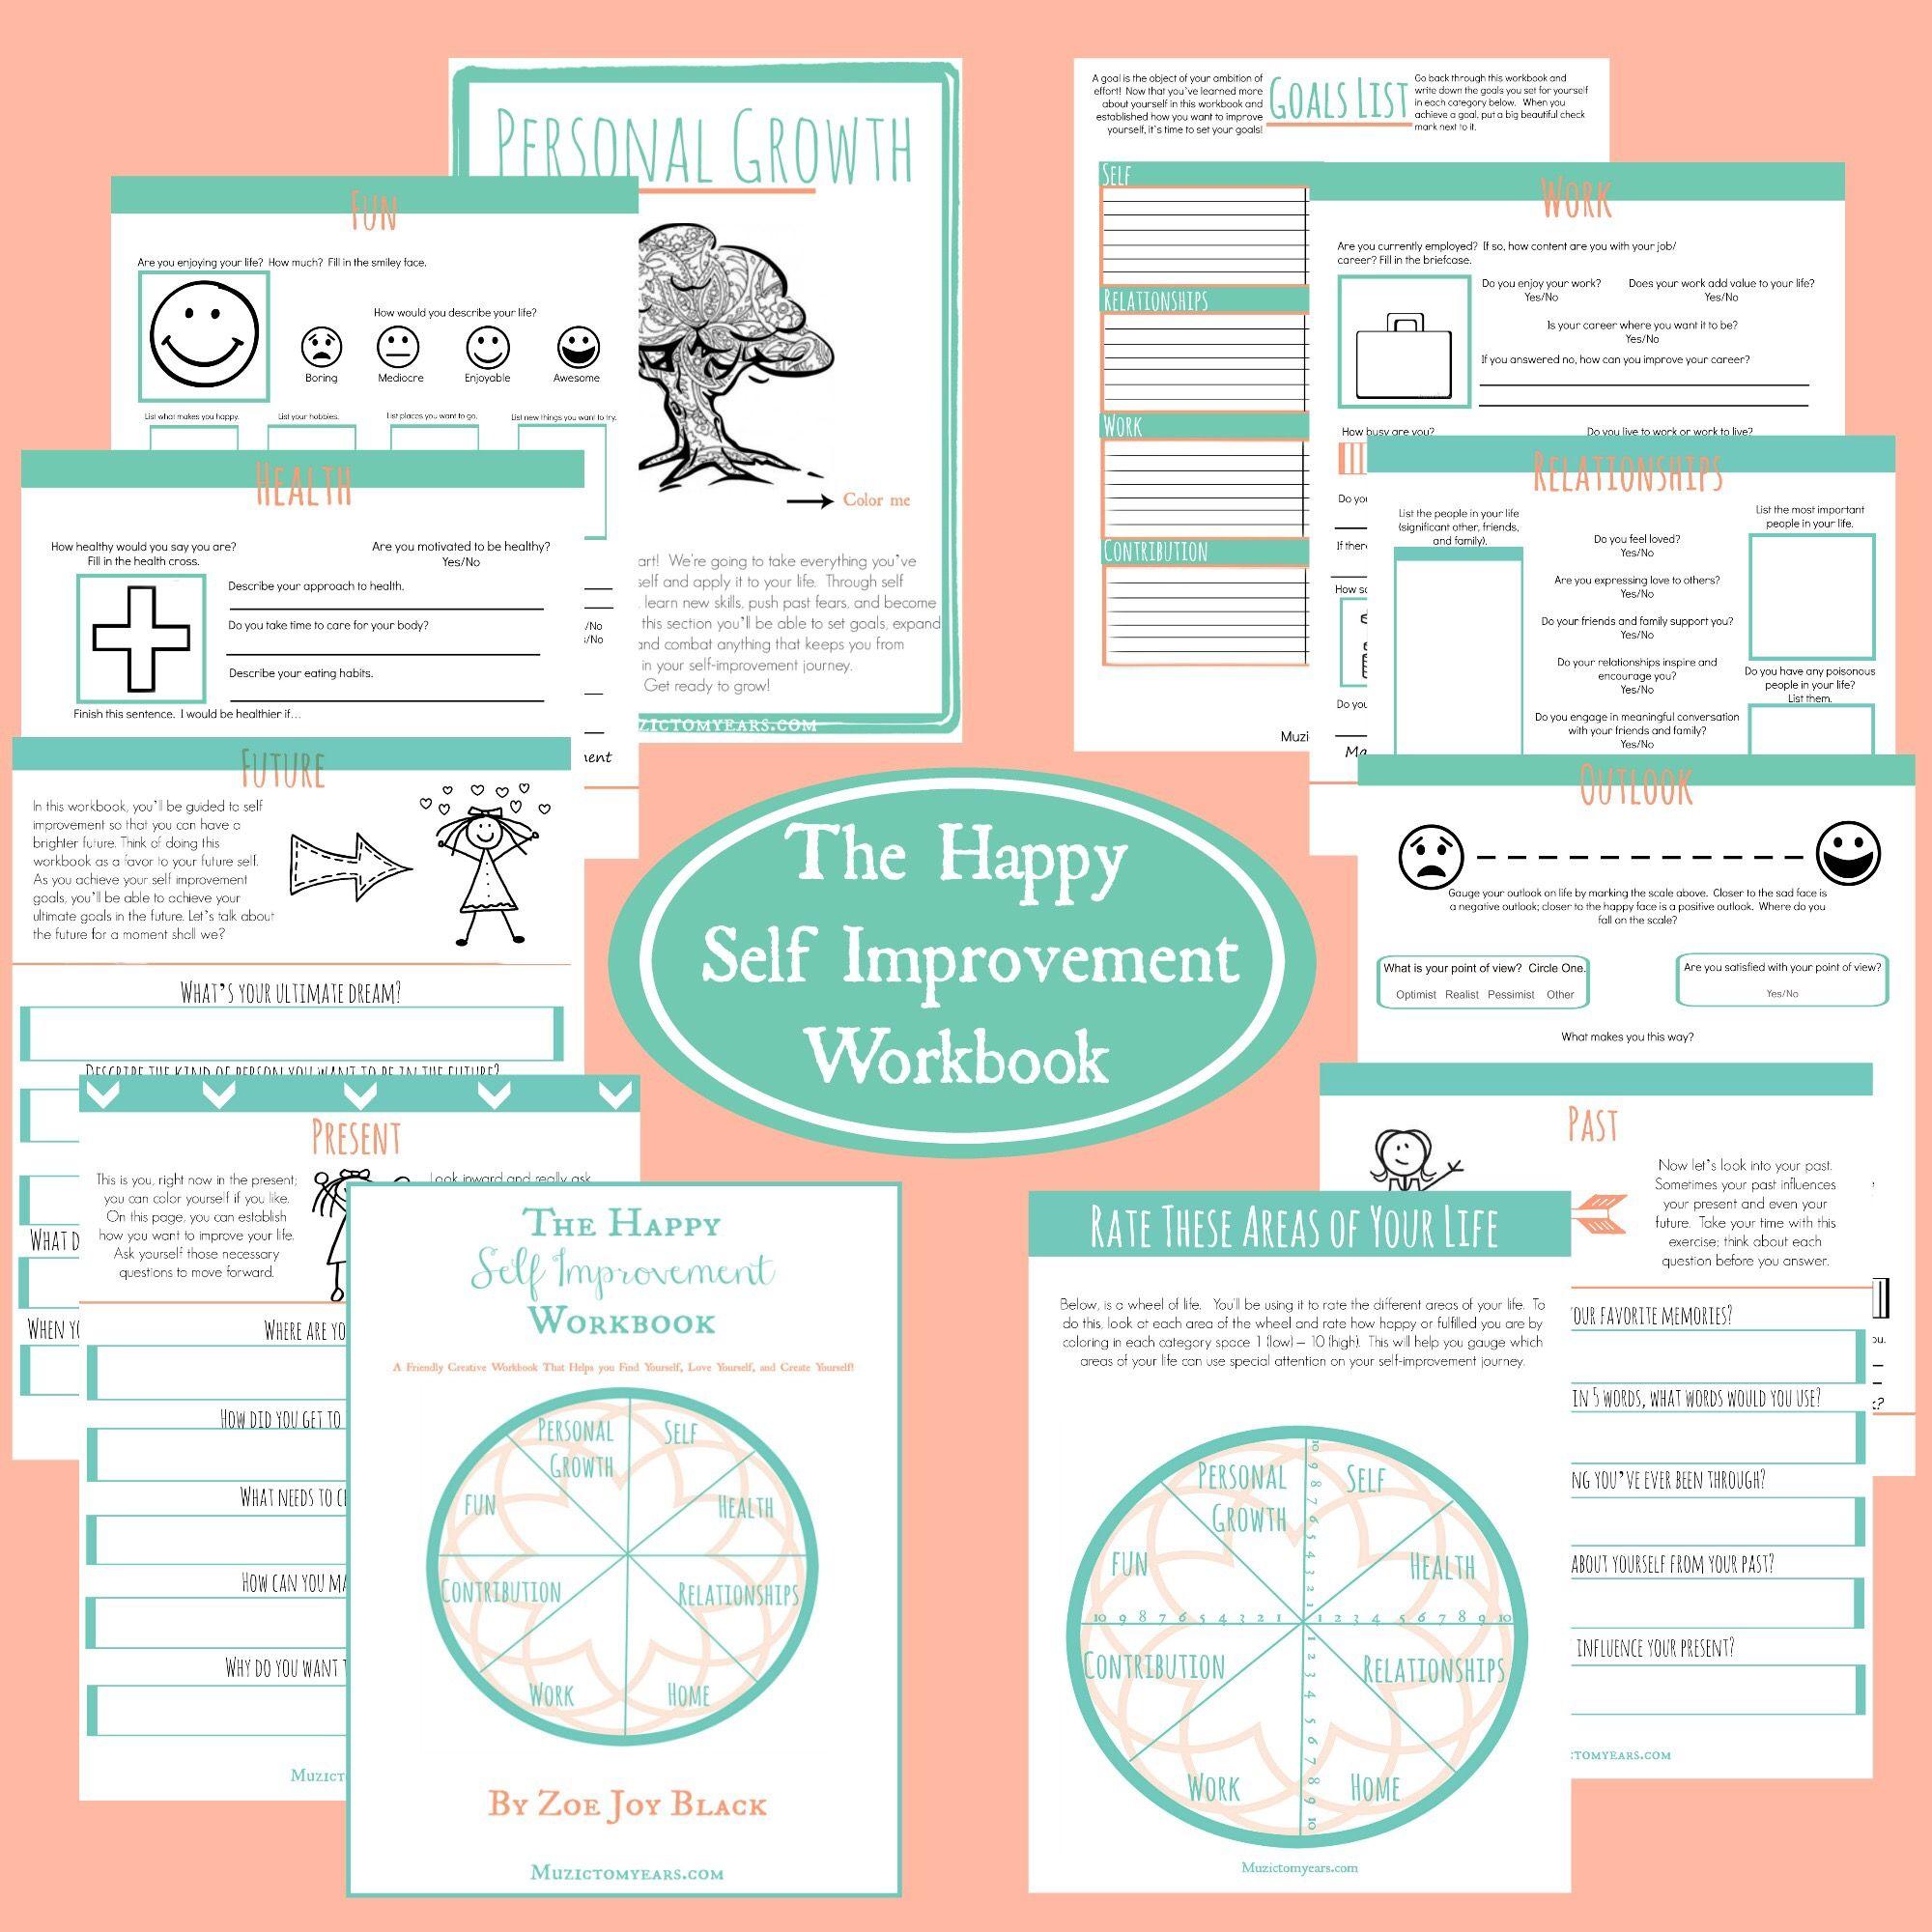 The Happy Self Improvement Workbook